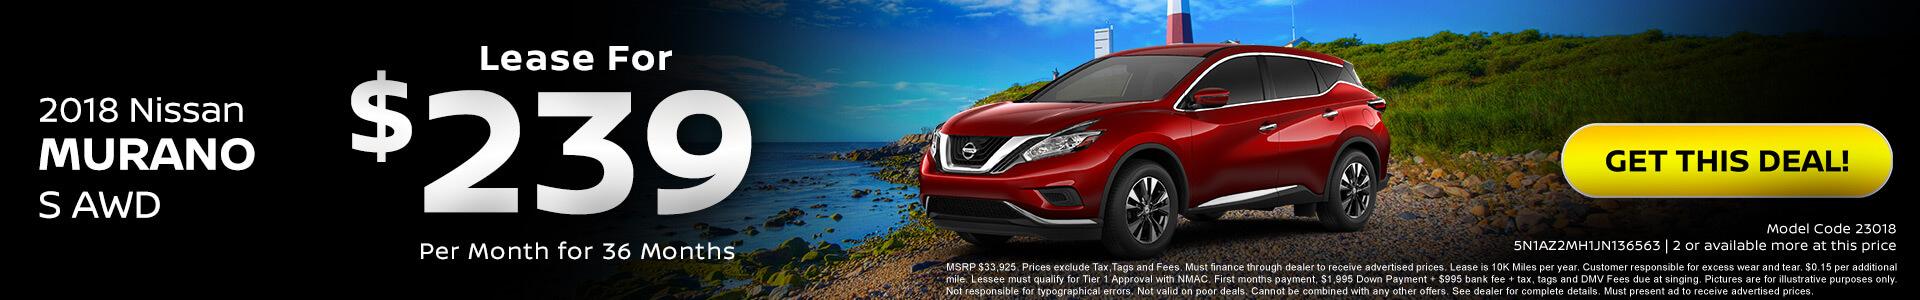 Nissan Murano $239 Lease